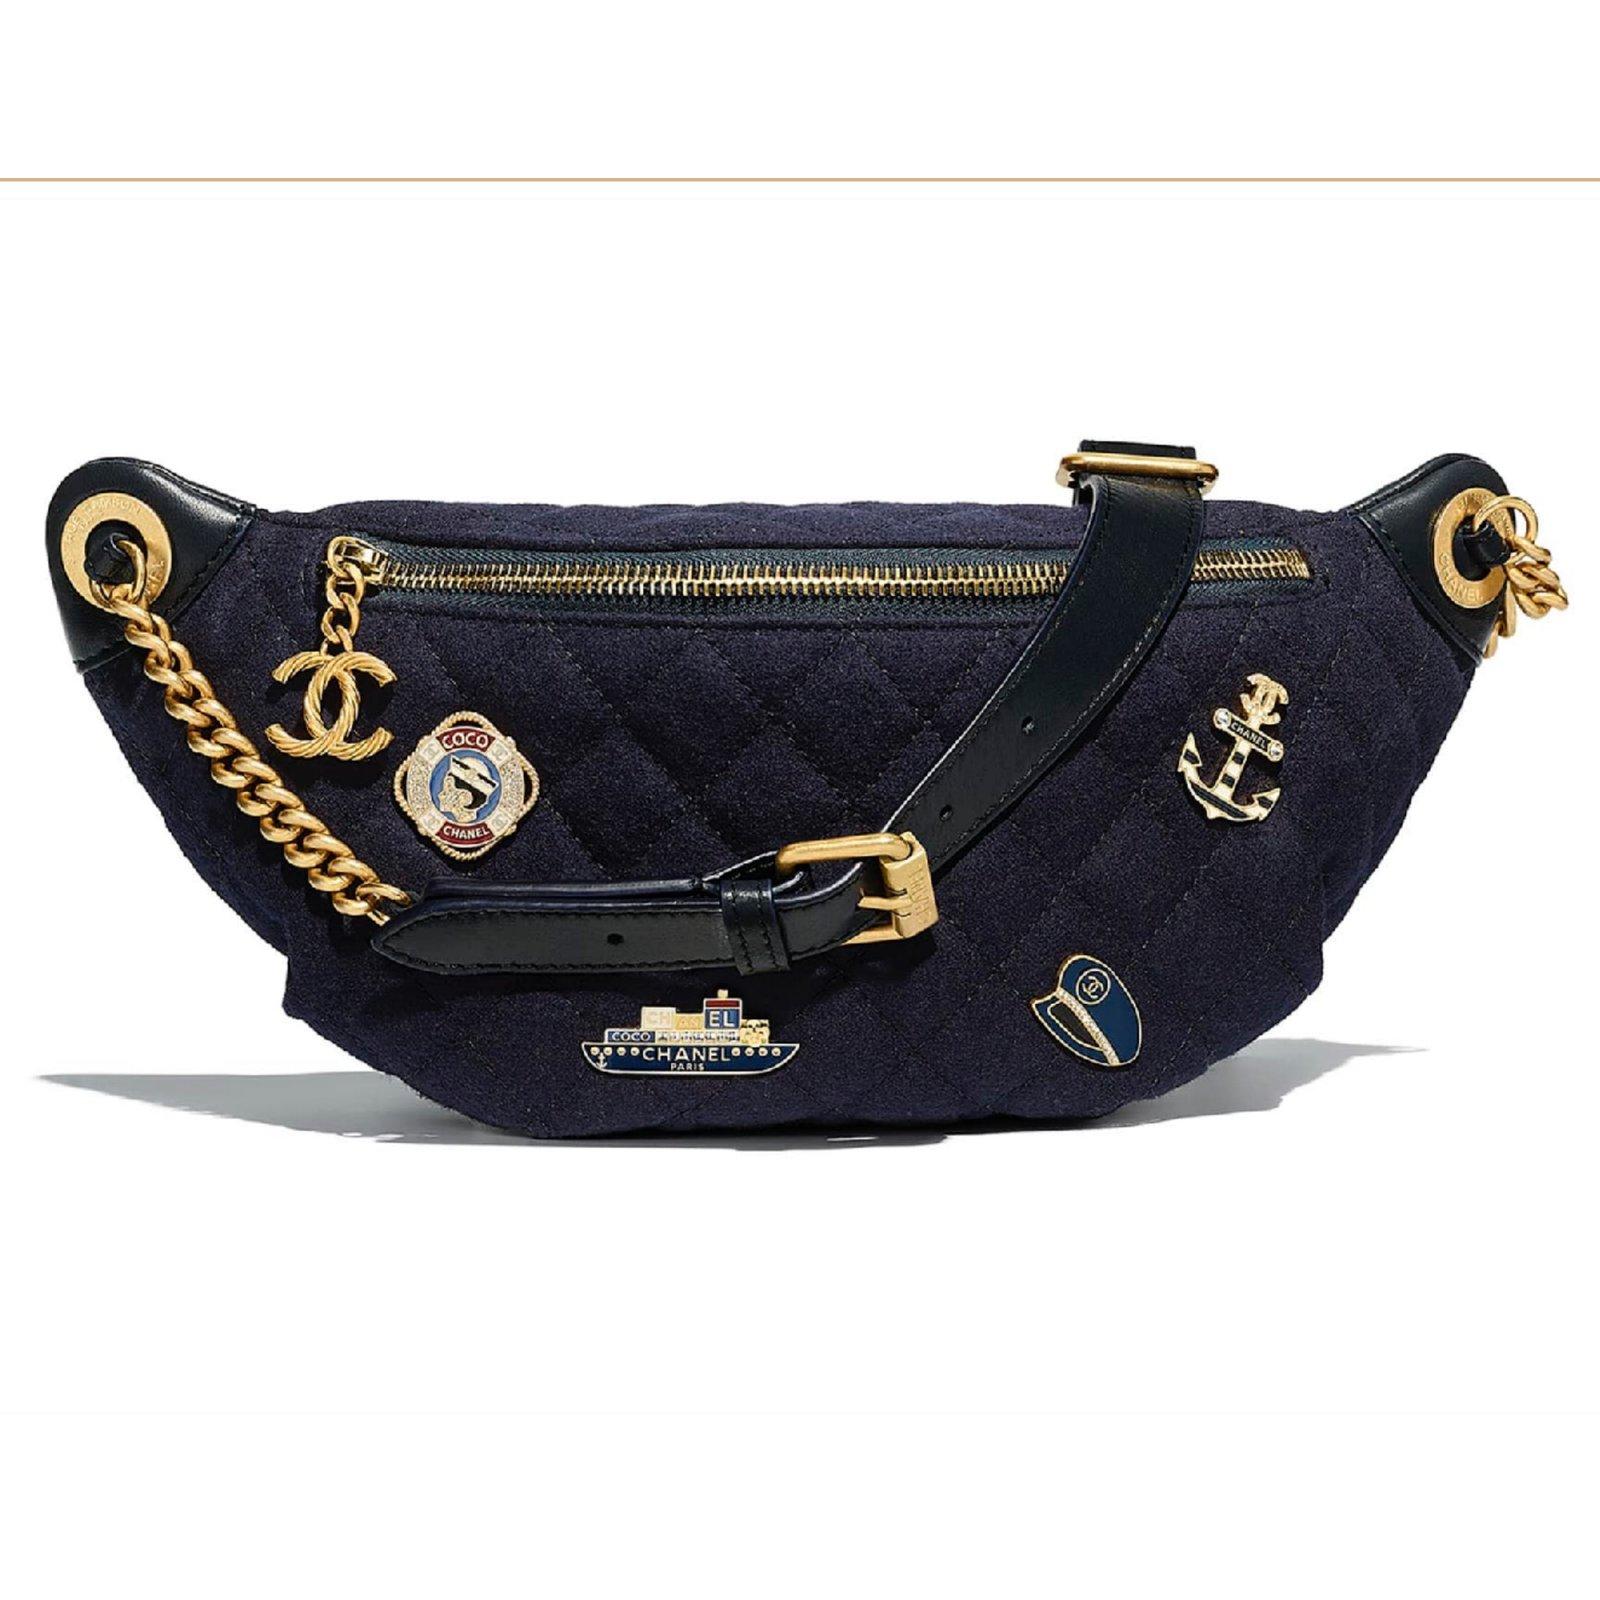 d80d44c64f57bc Chanel CHANEL Belt 2018 Bag Handbags Wool Navy blue ref.74157 - Joli ...